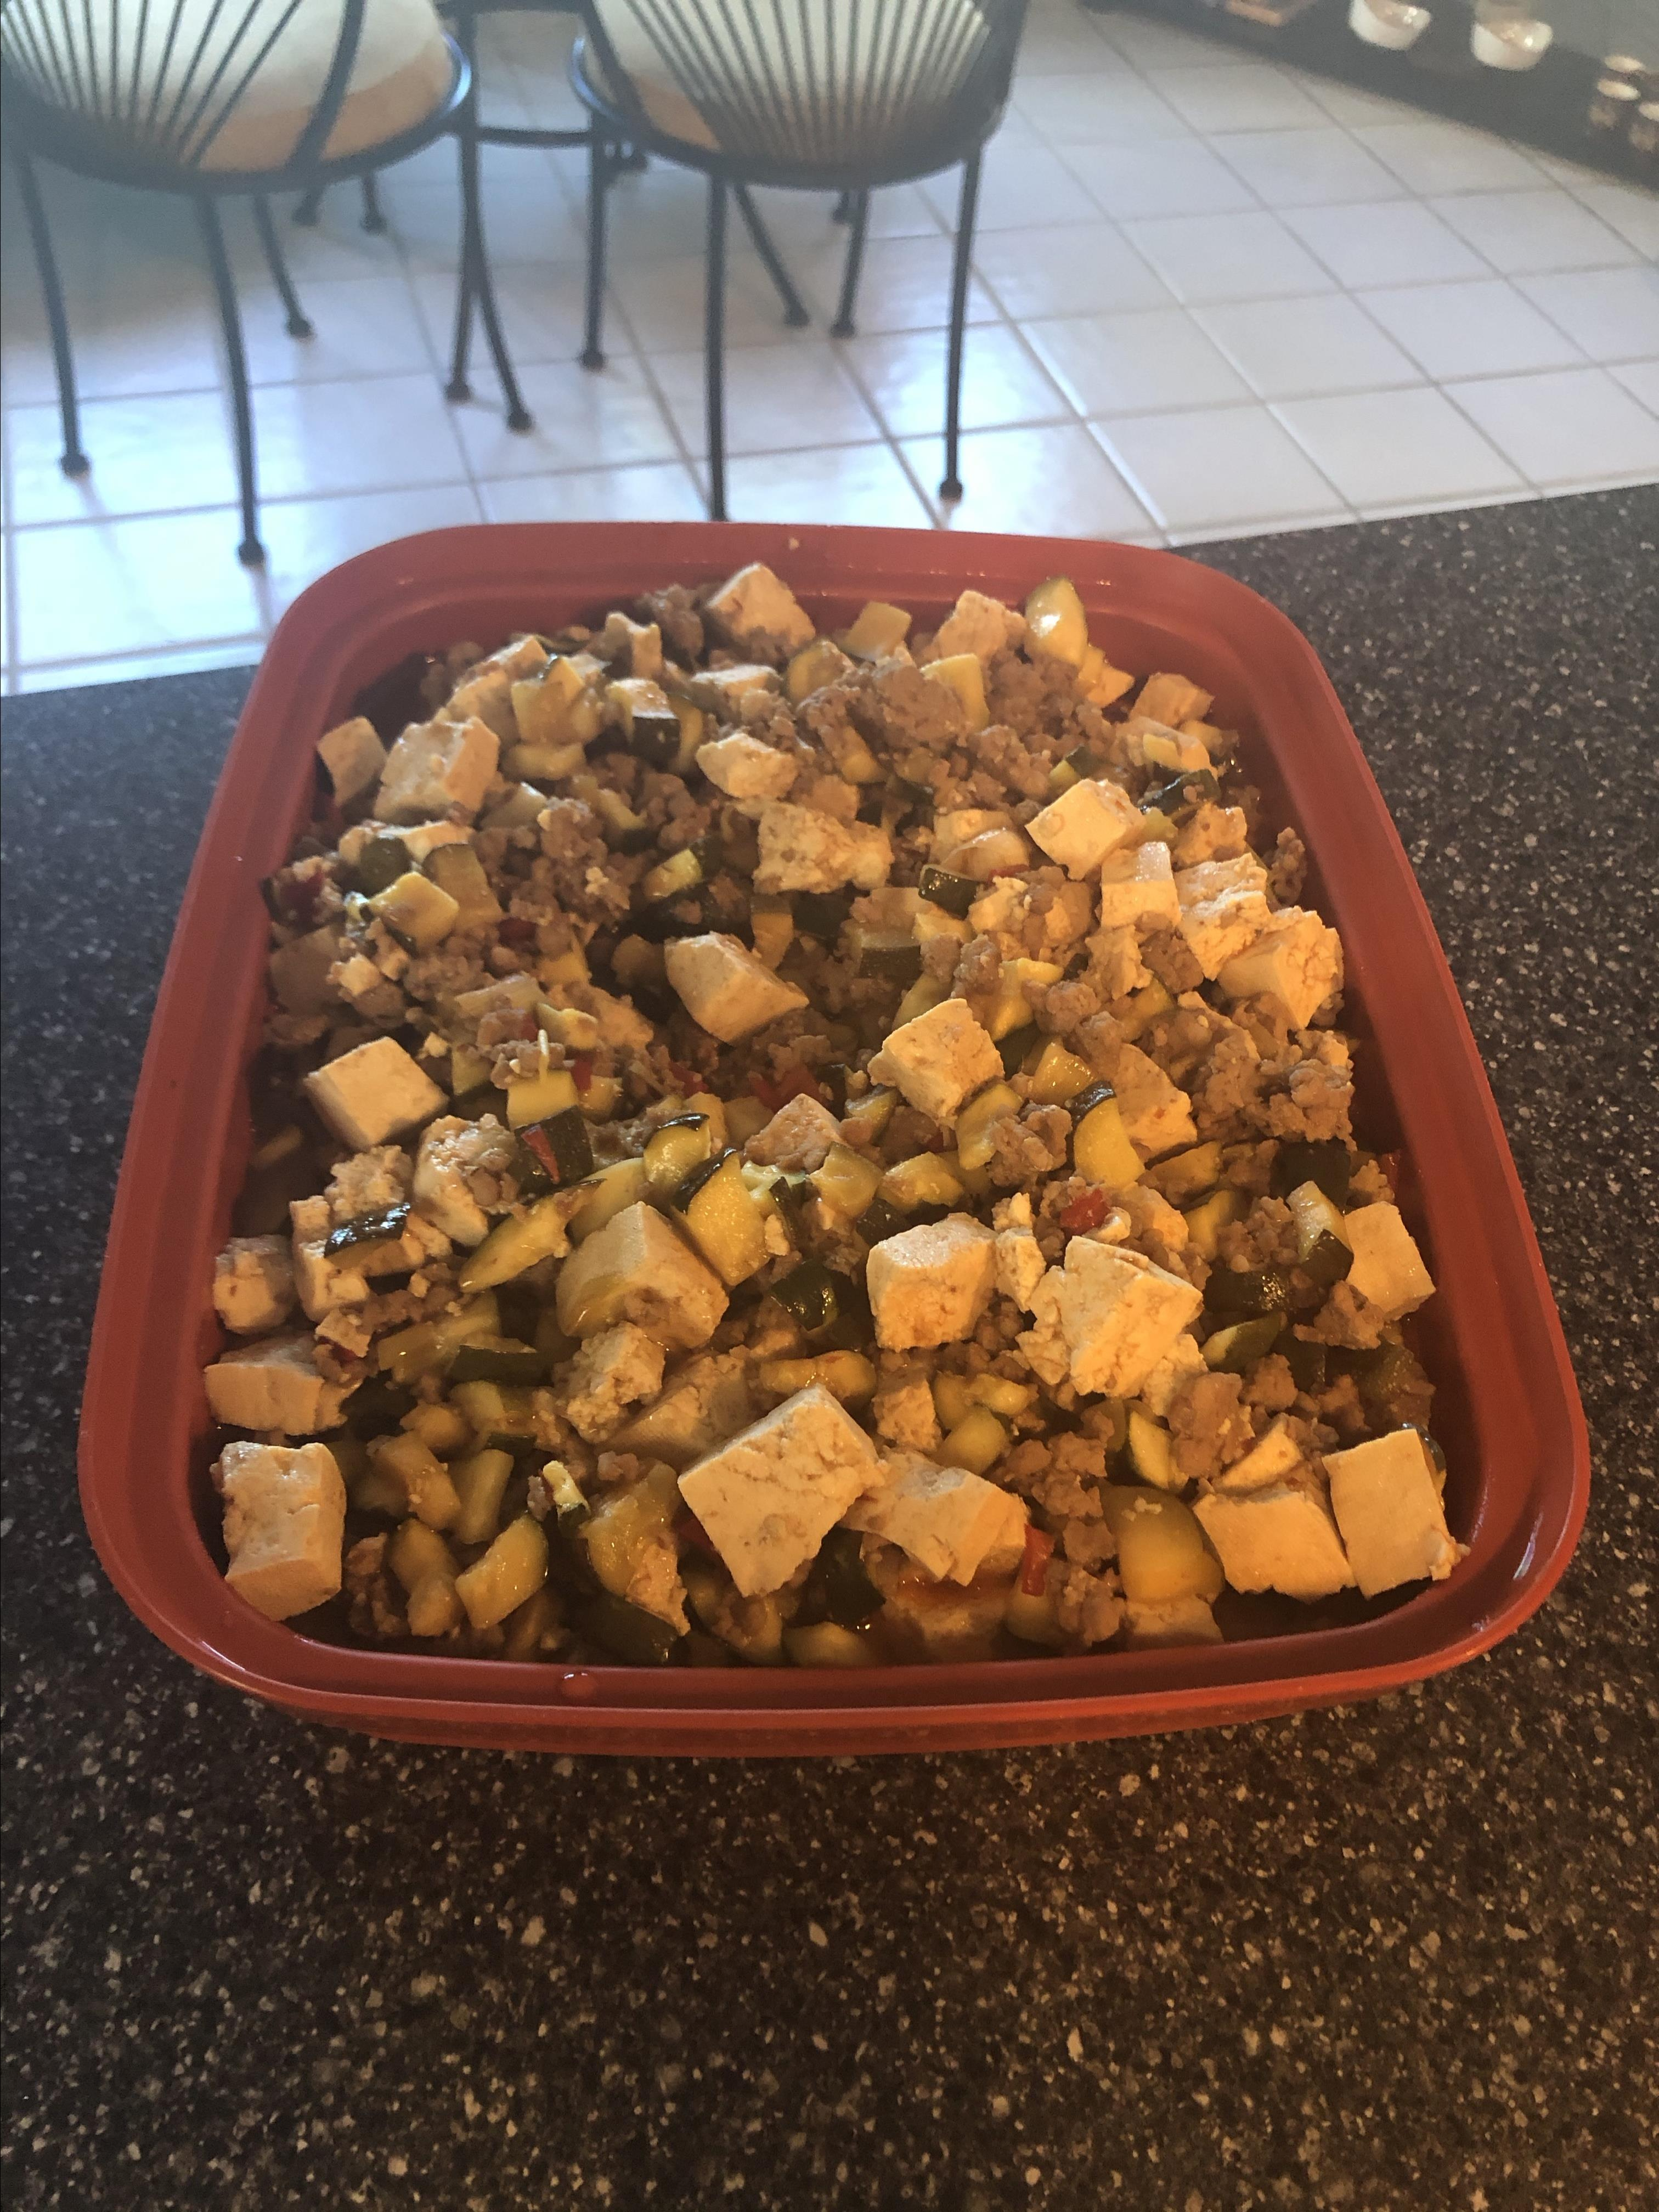 Spicy Pork and Vegetable Tofu Jeffrie